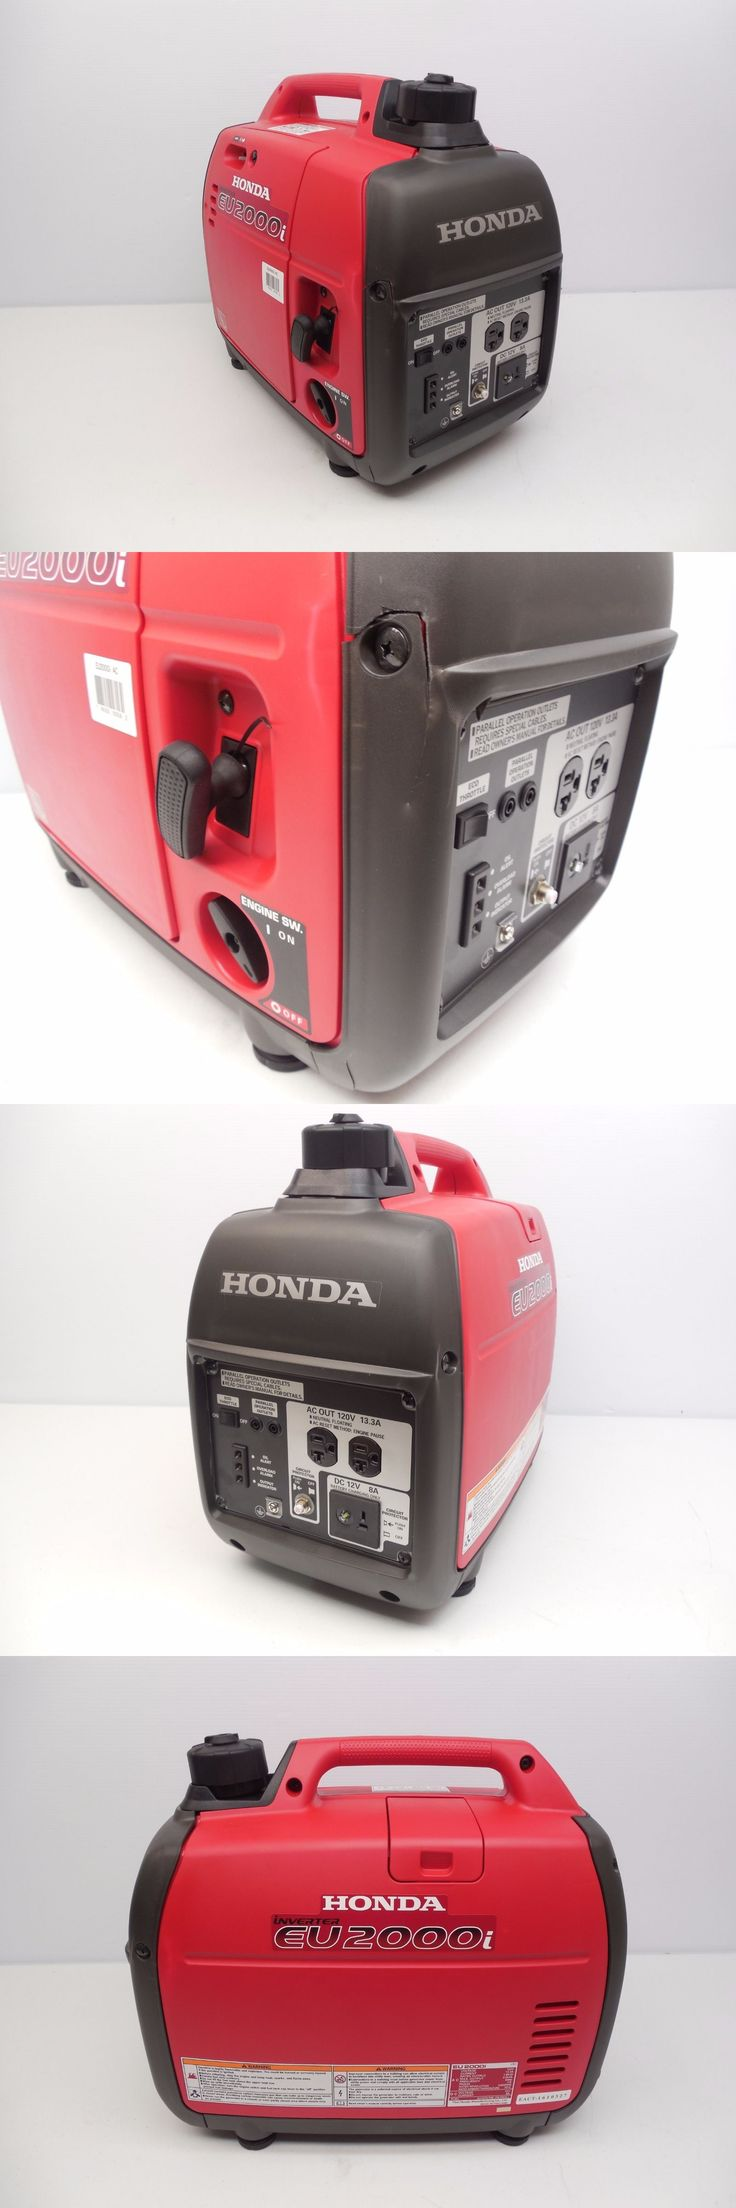 Generators 33082: Honda Eu Series 2000-Watt Portable Inverter Generator Eu2000i Super Quiet!!**Fr -> BUY IT NOW ONLY: $899.99 on eBay!